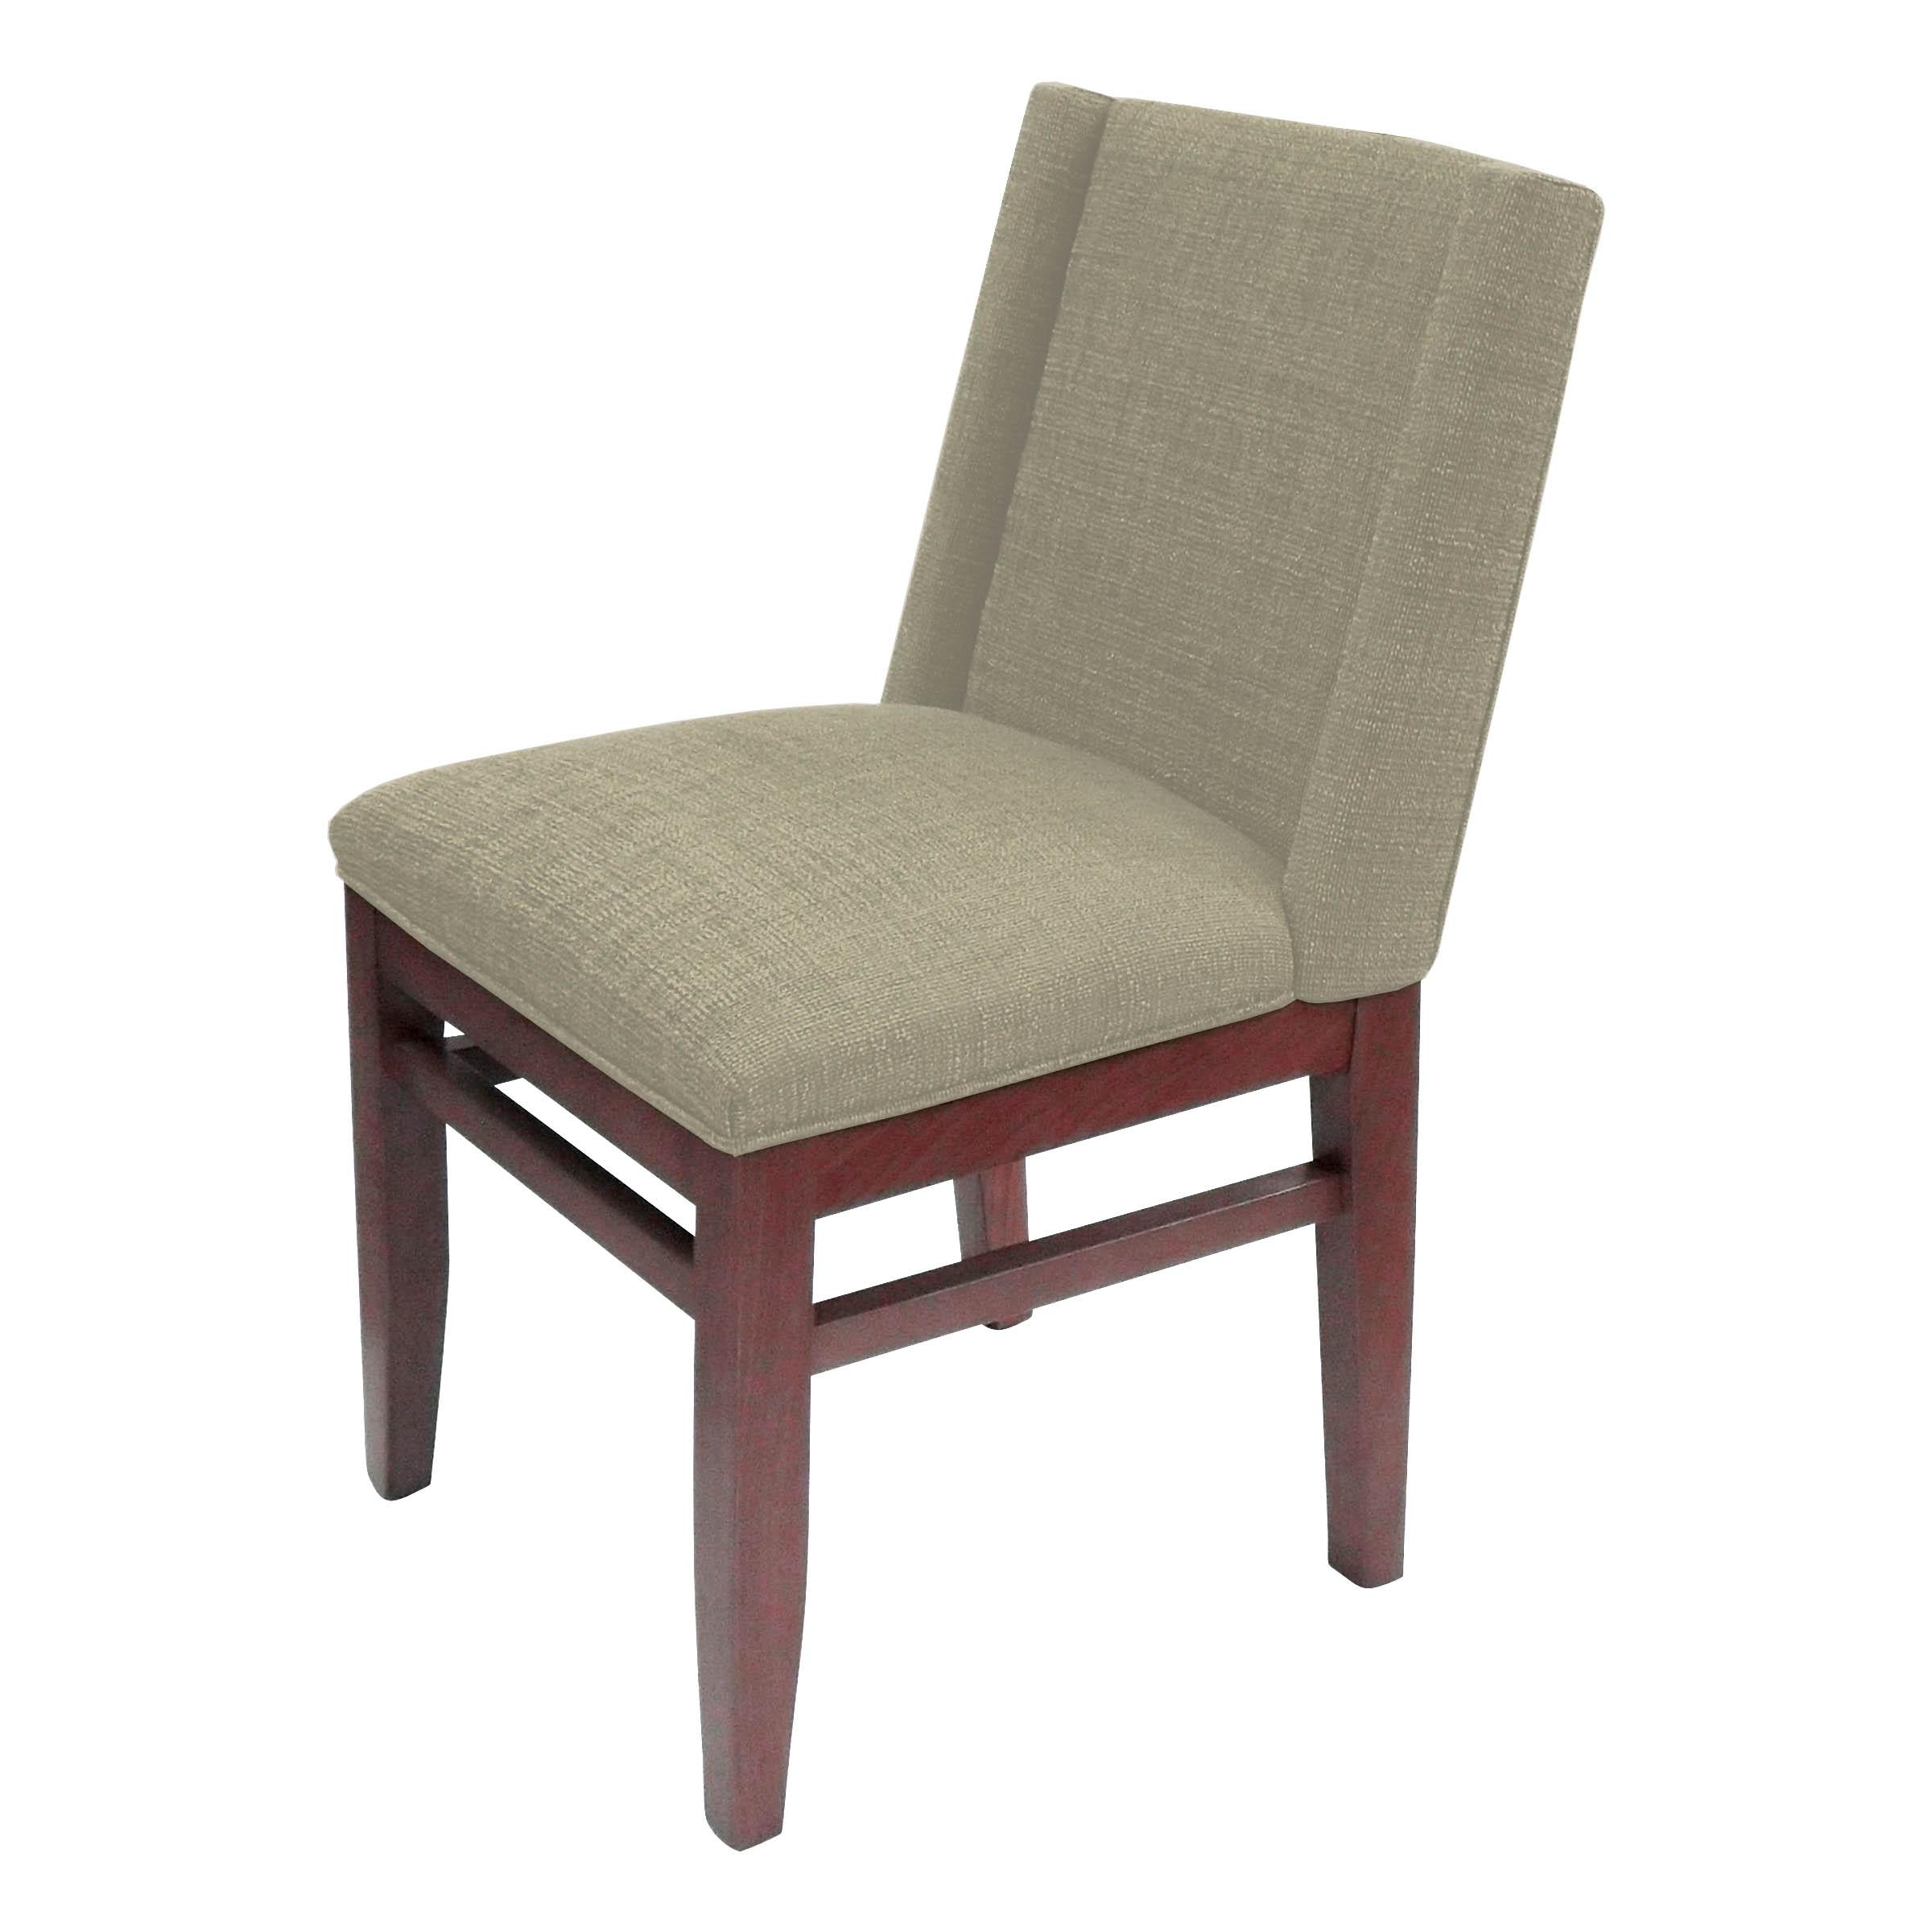 28 outdoor furniture leg protectors 8 16x furniture table c